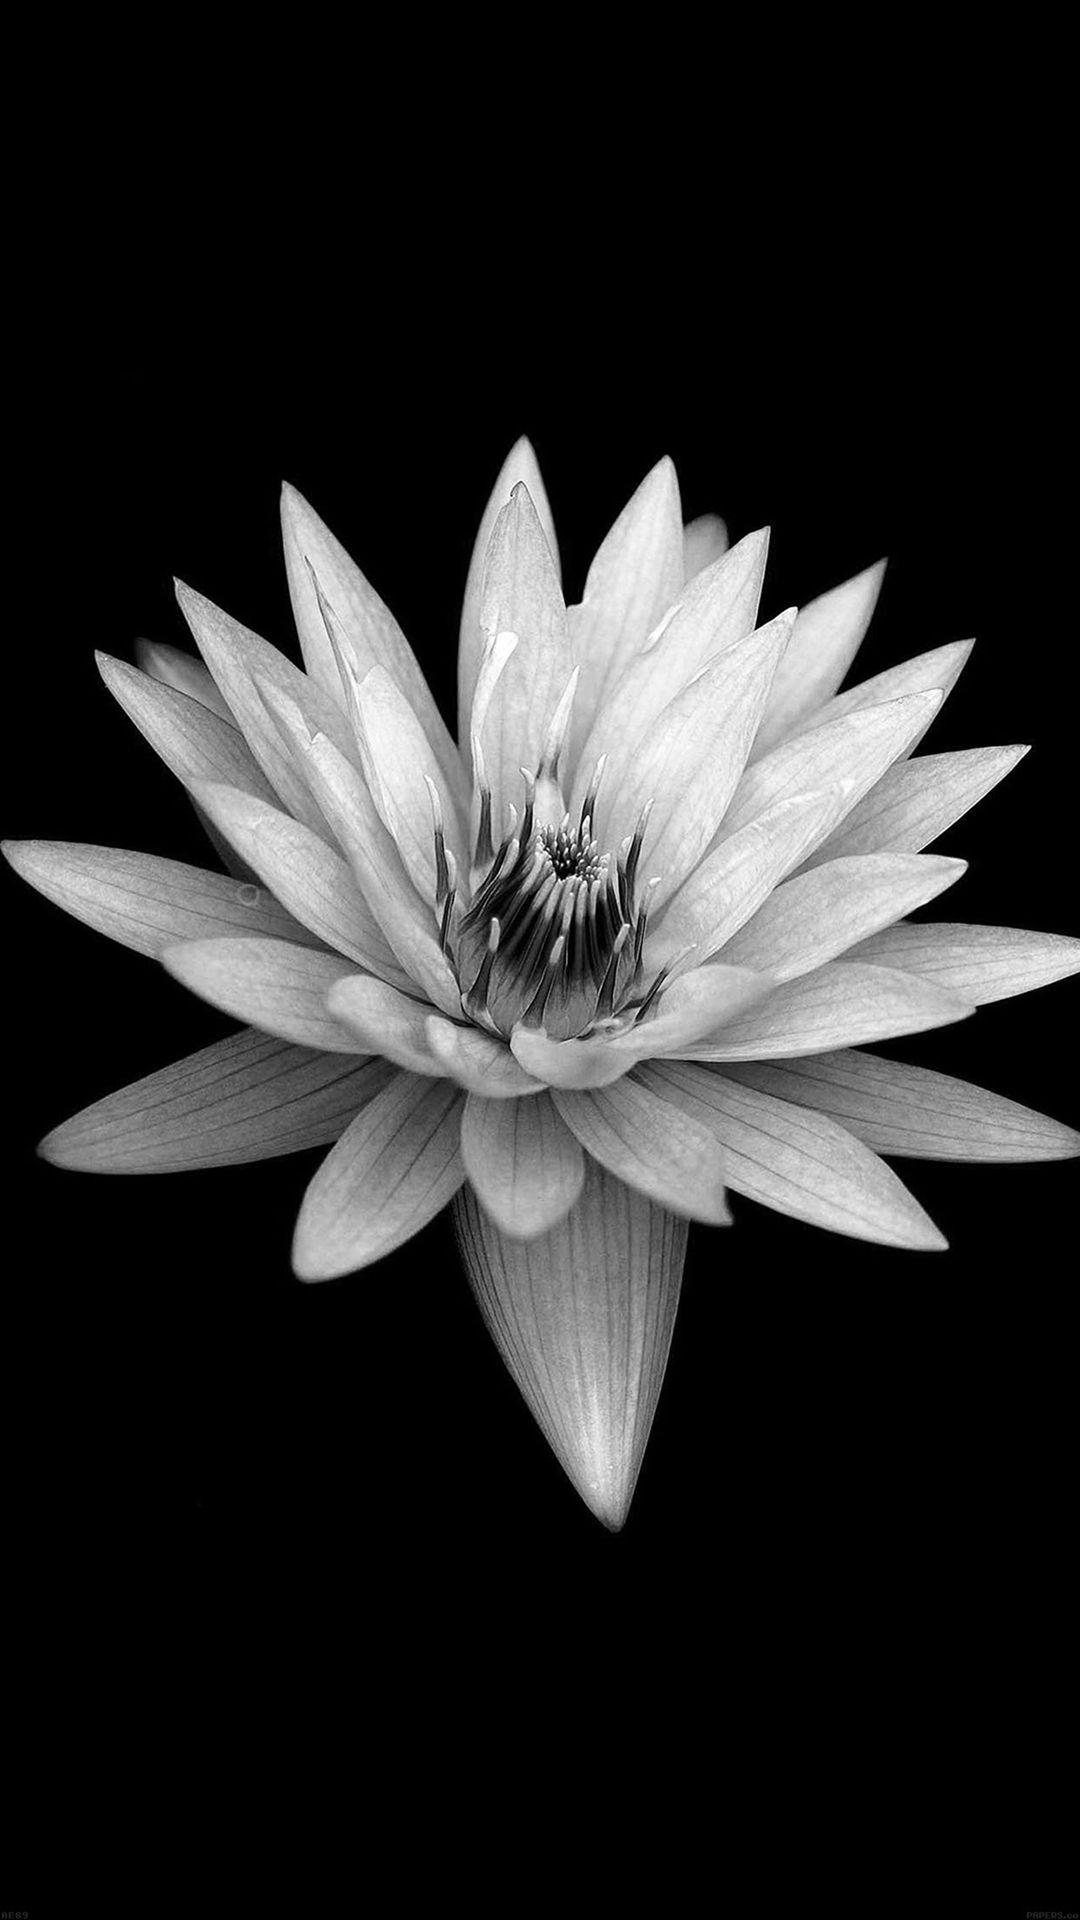 Dark Flower Black Xperia Z Background iPhone 8